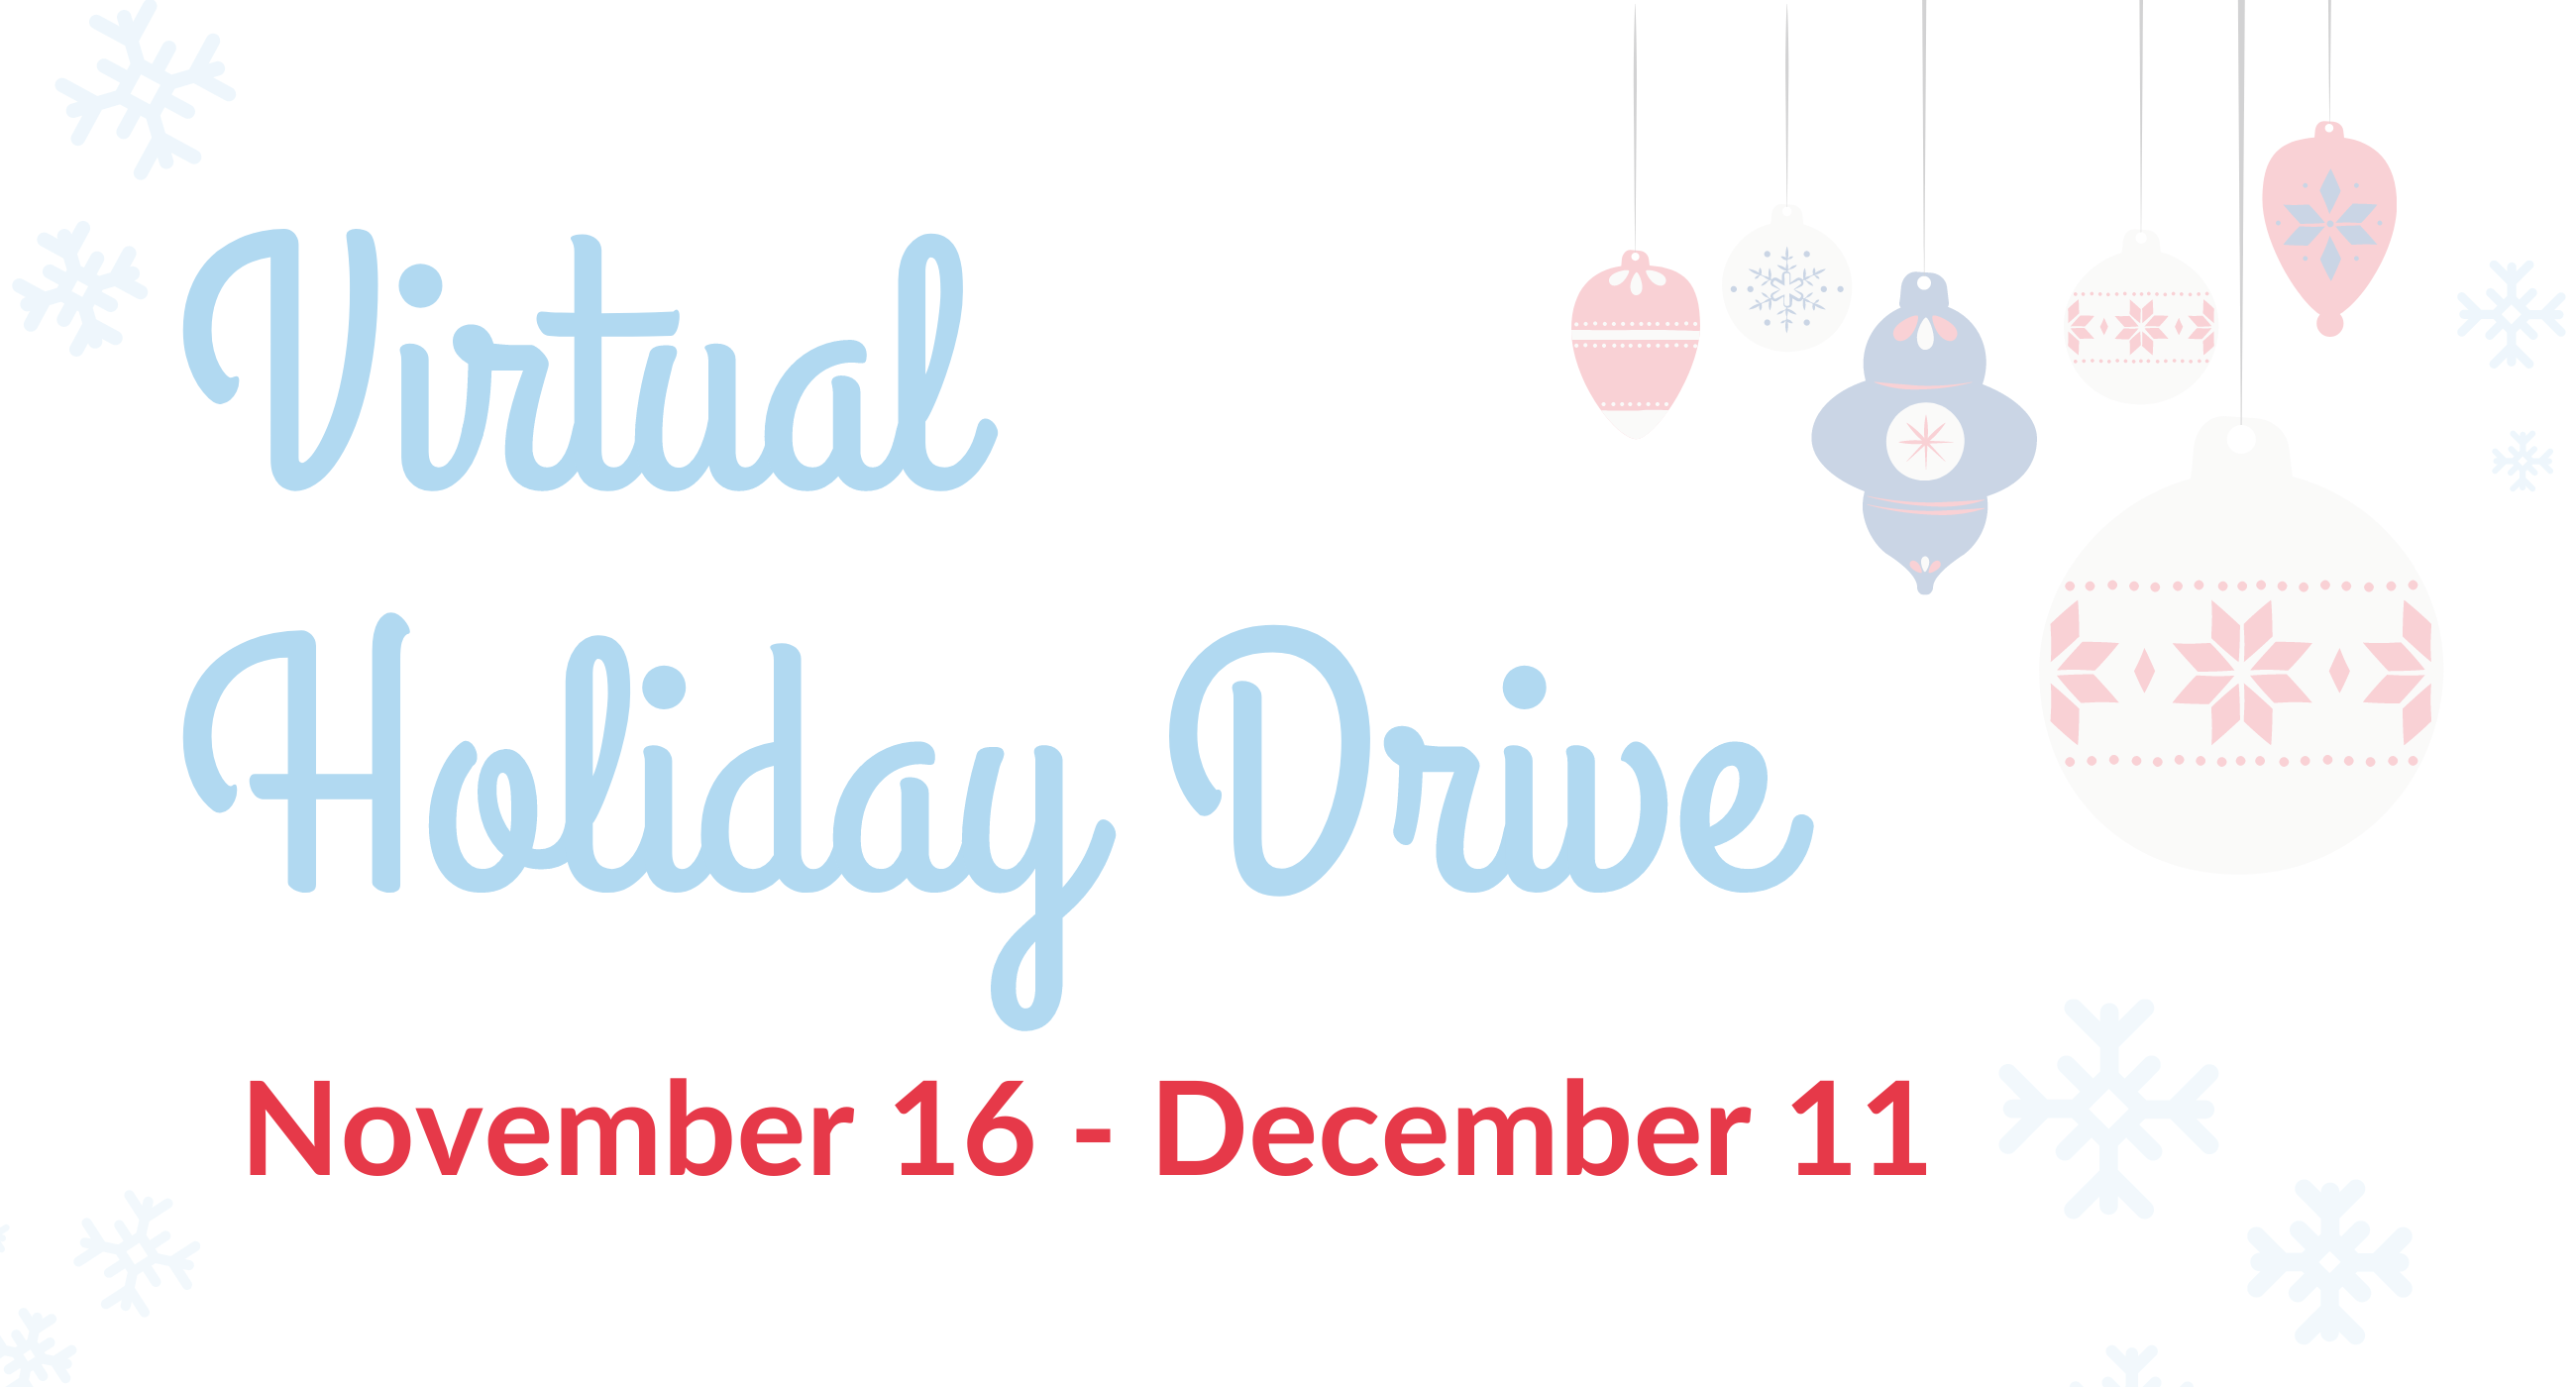 Copy of BI Virtual Holiday Drive